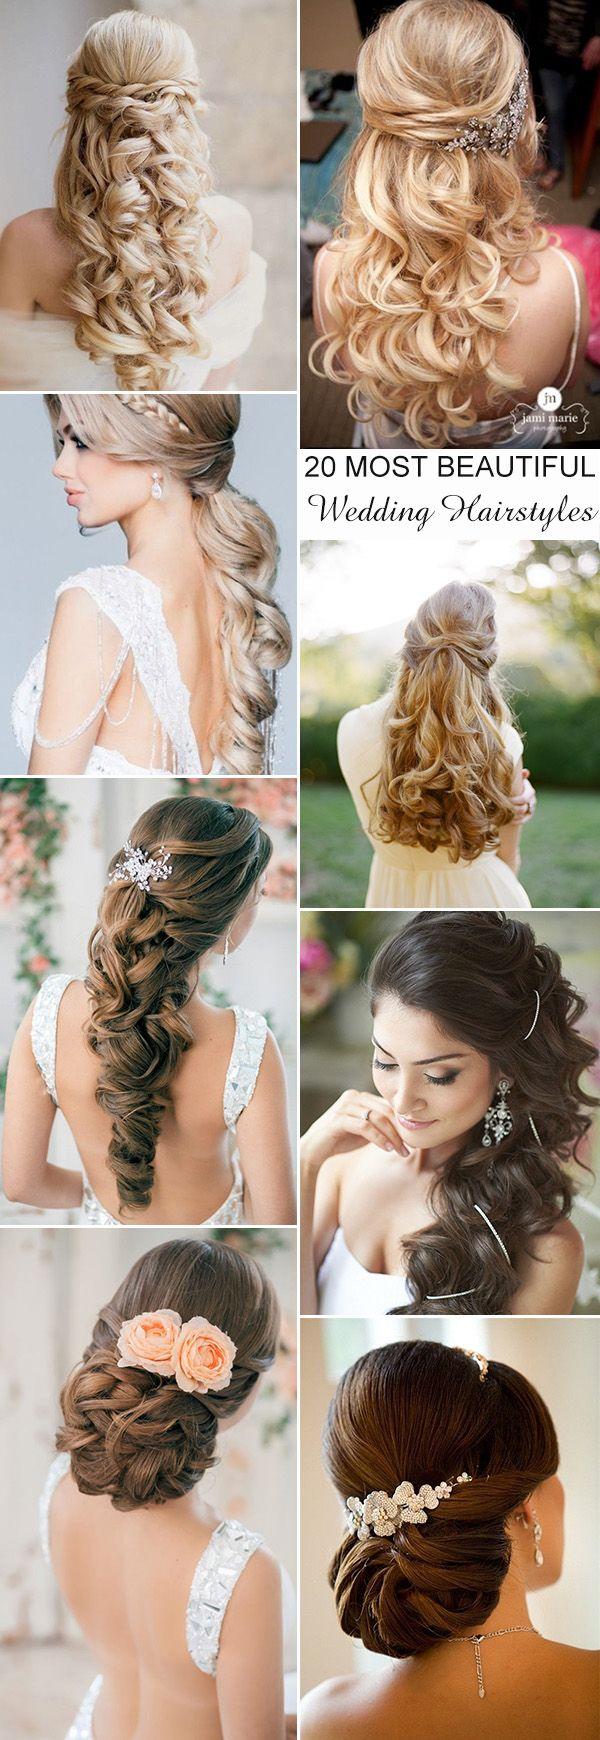 20 most elegant and beautiful wedding hairstyles | weddings